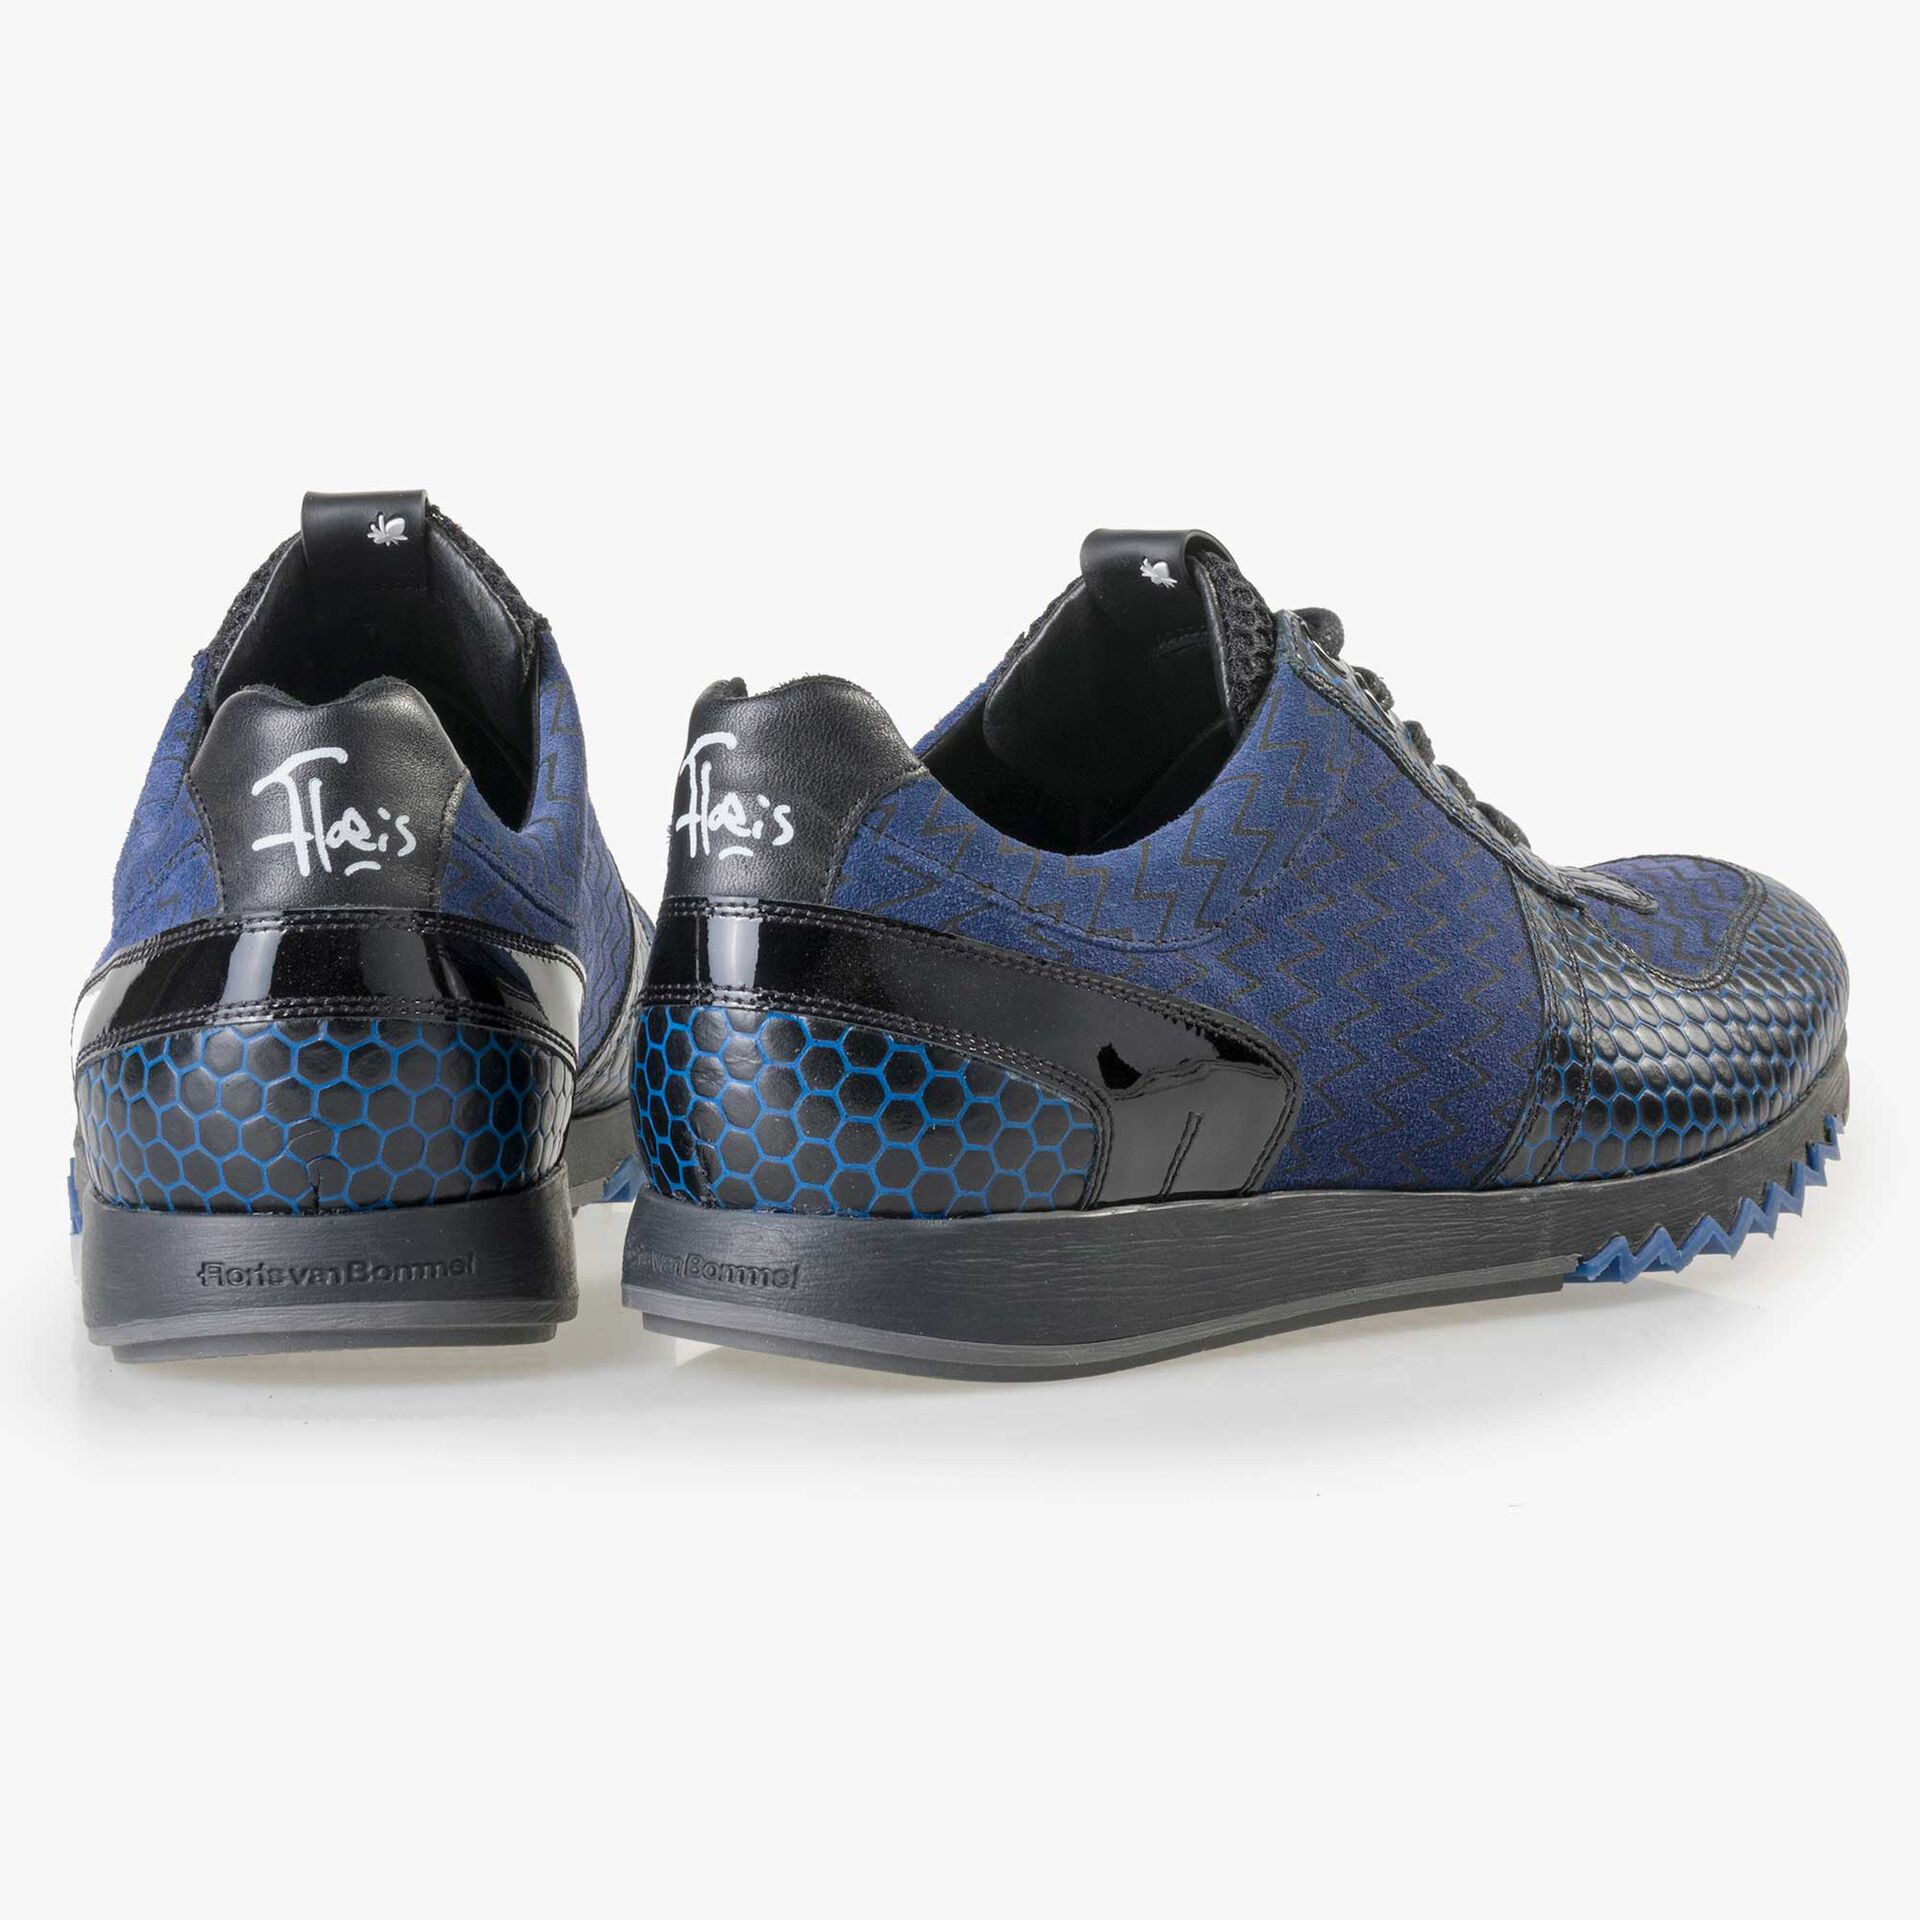 Floris van Bommel blauer Herren Leder Sneaker